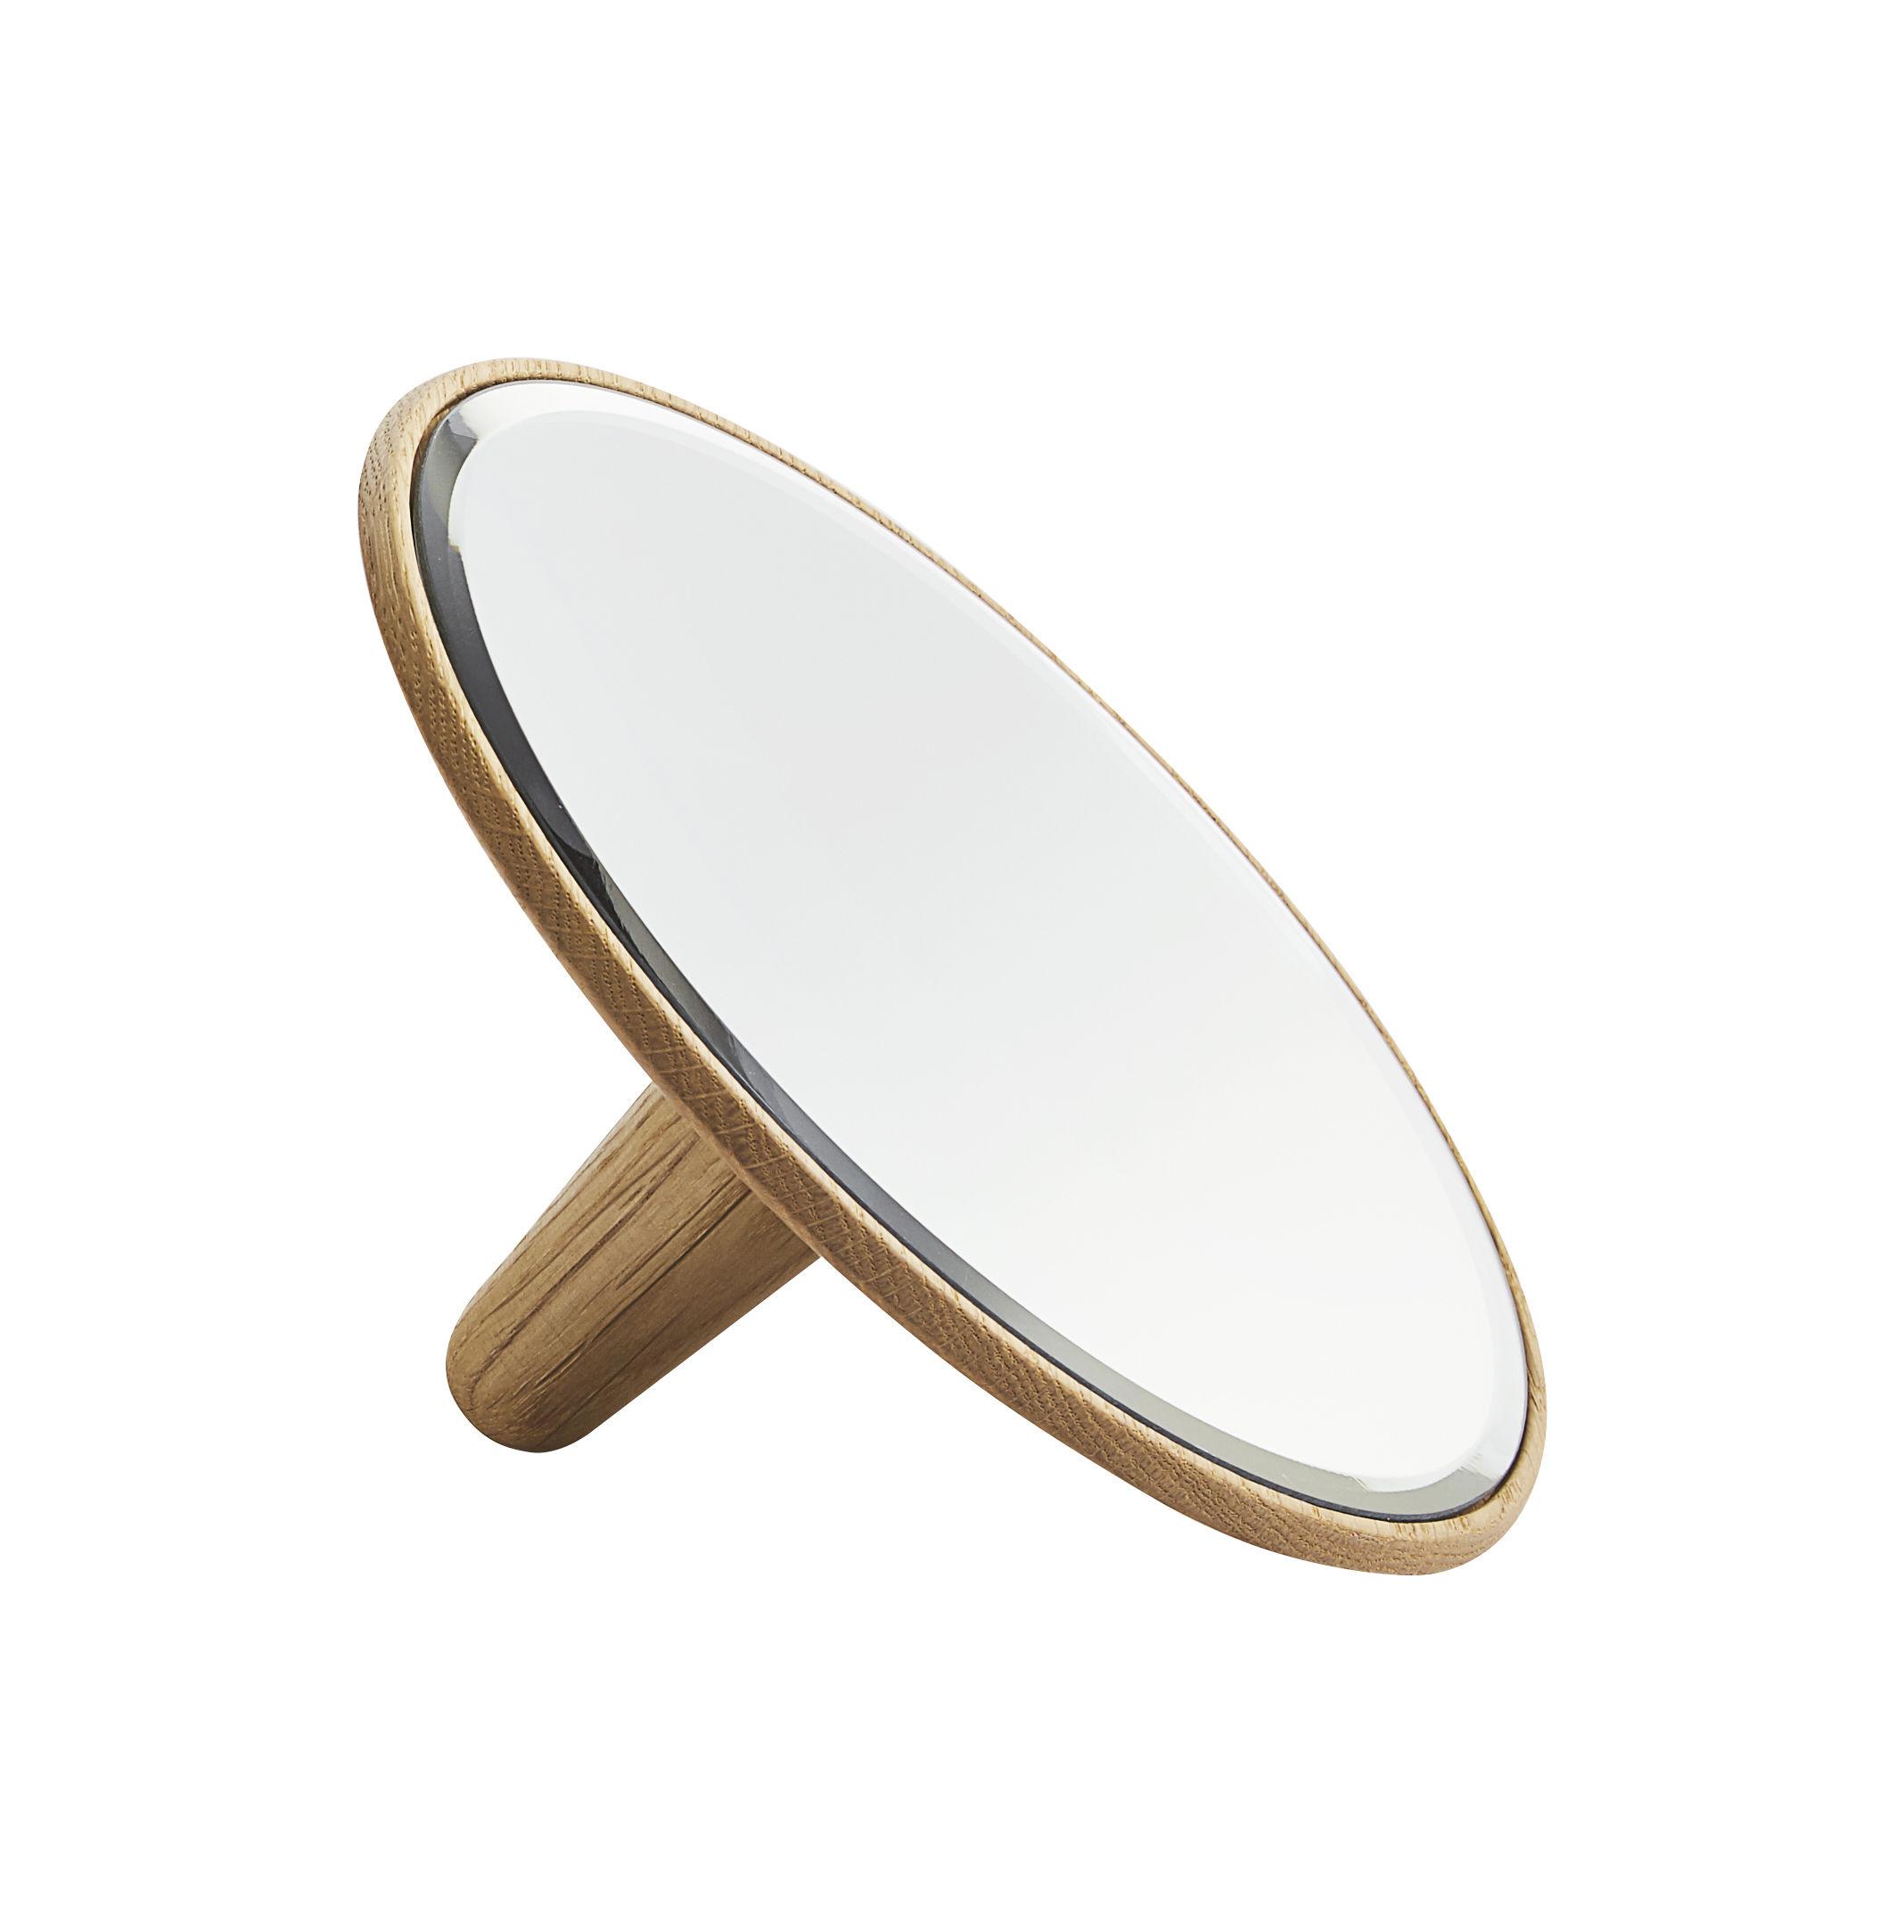 spiegel barb small von woud holz natur made in design. Black Bedroom Furniture Sets. Home Design Ideas